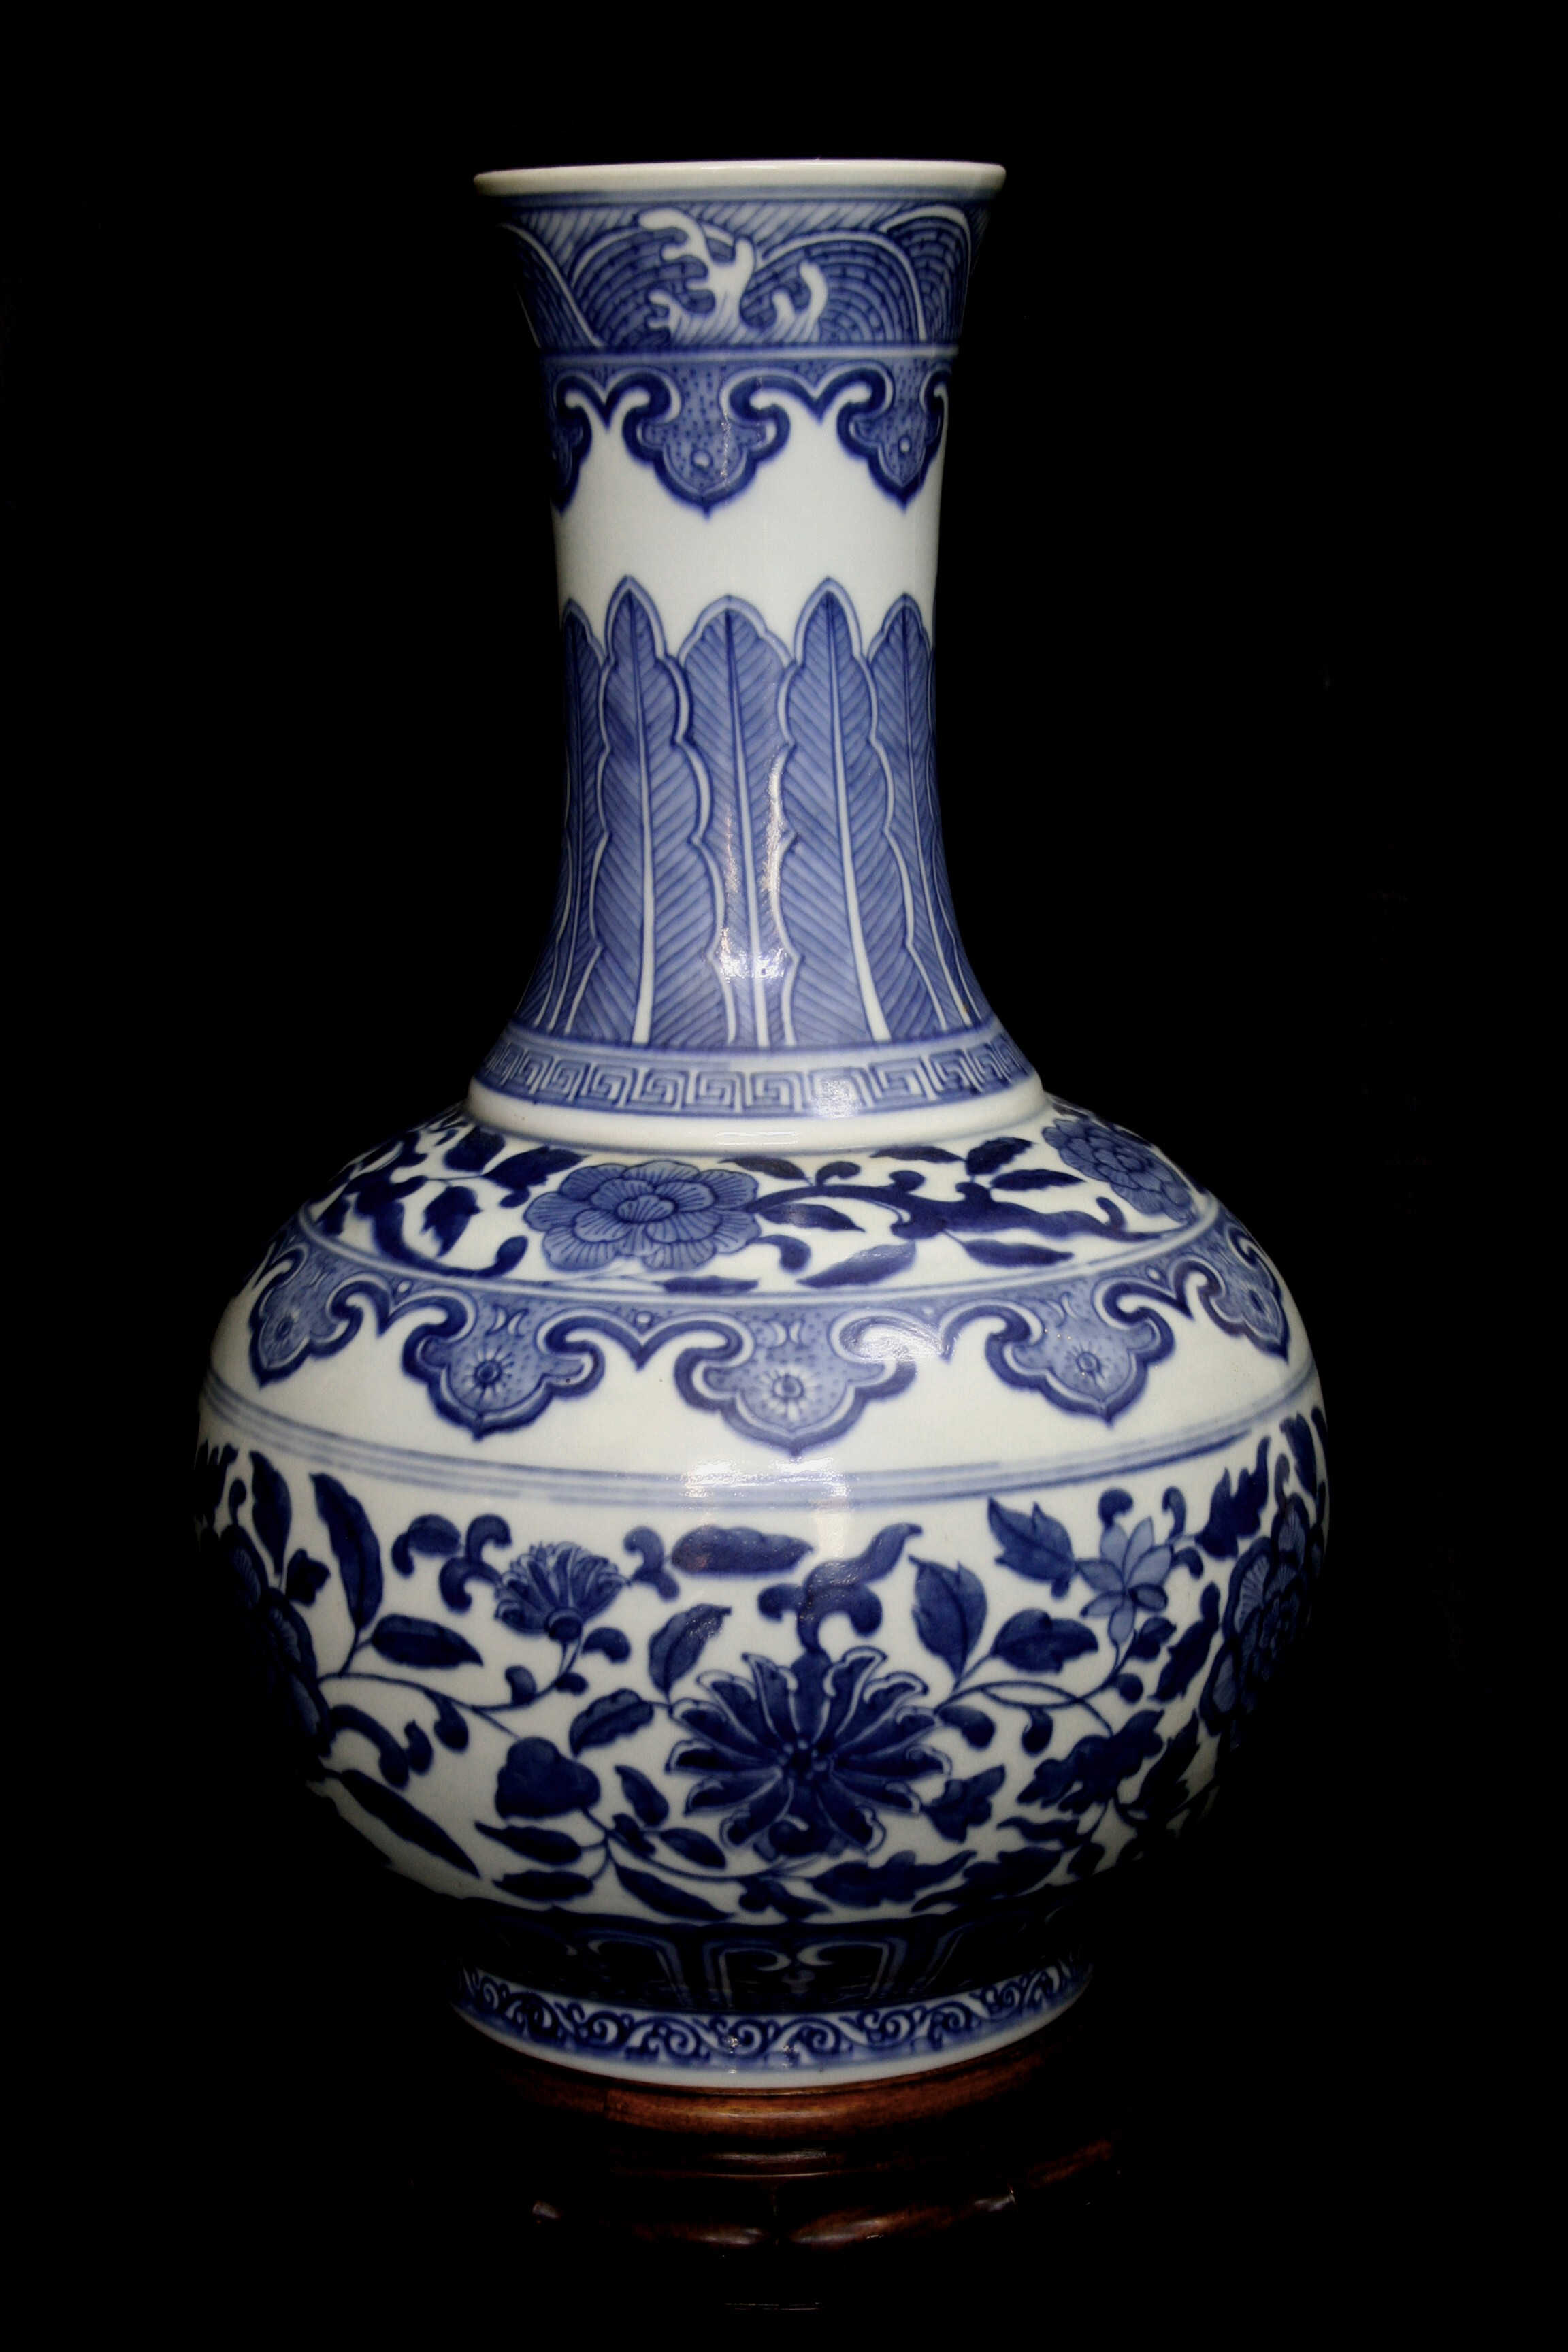 Tongzhi porcelain wikipedia imperial presentation vase tongzhi mark and period nantoys collection japan reviewsmspy